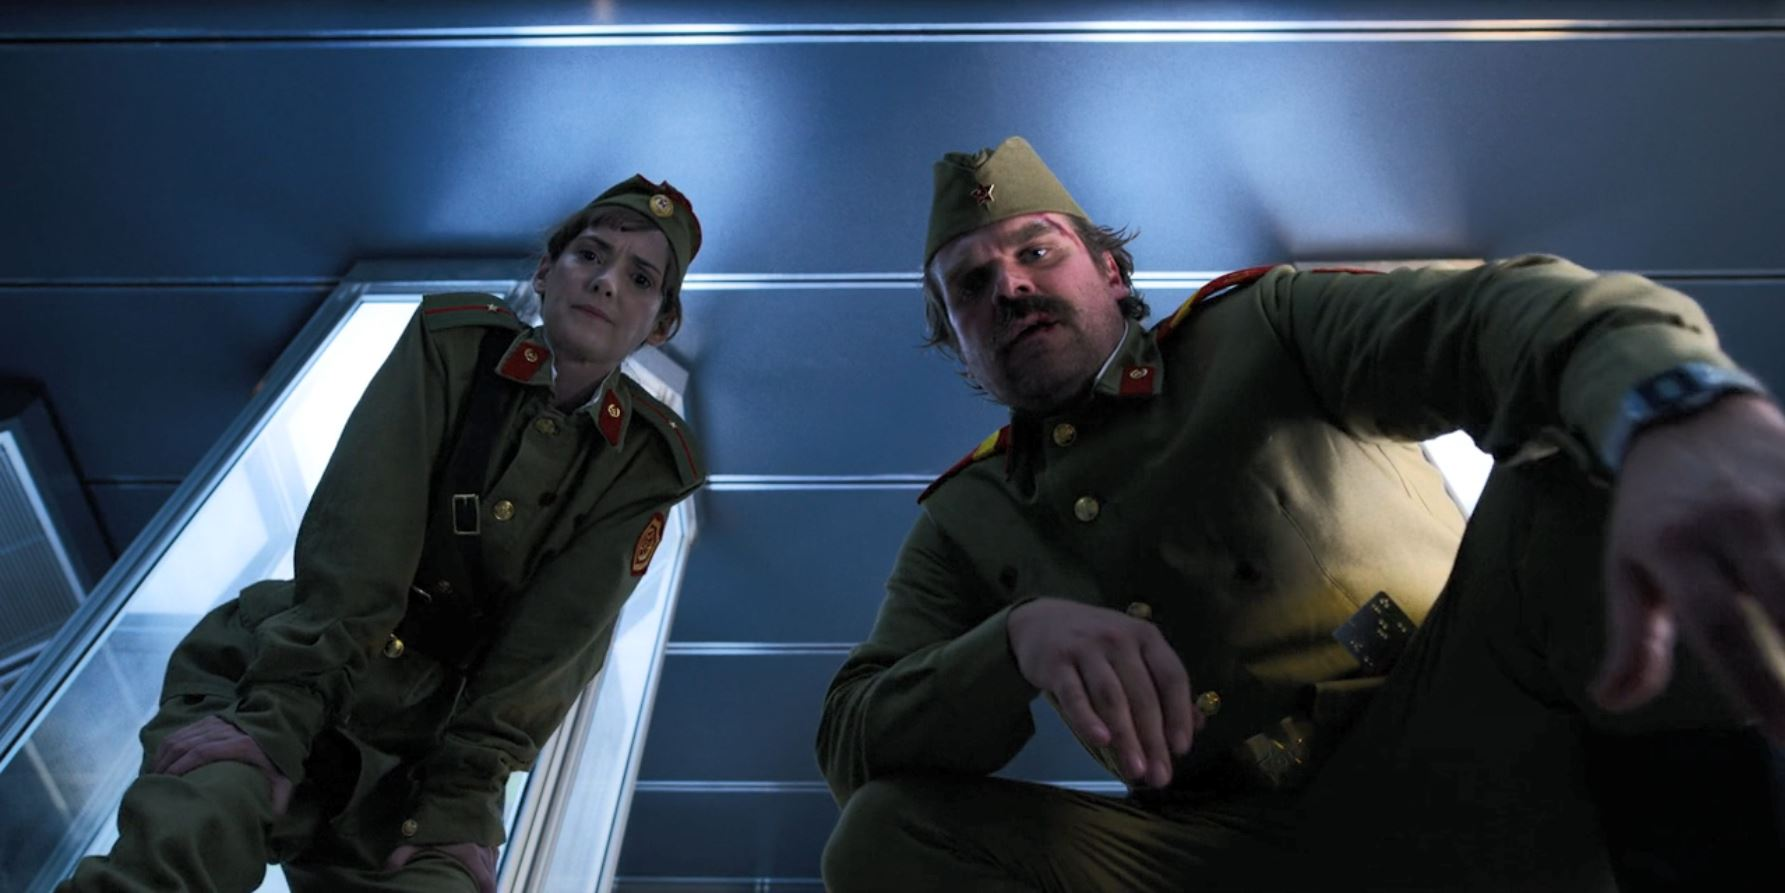 Stranger Things Season 3 Review - Jim and Joyce in Russian uniforms